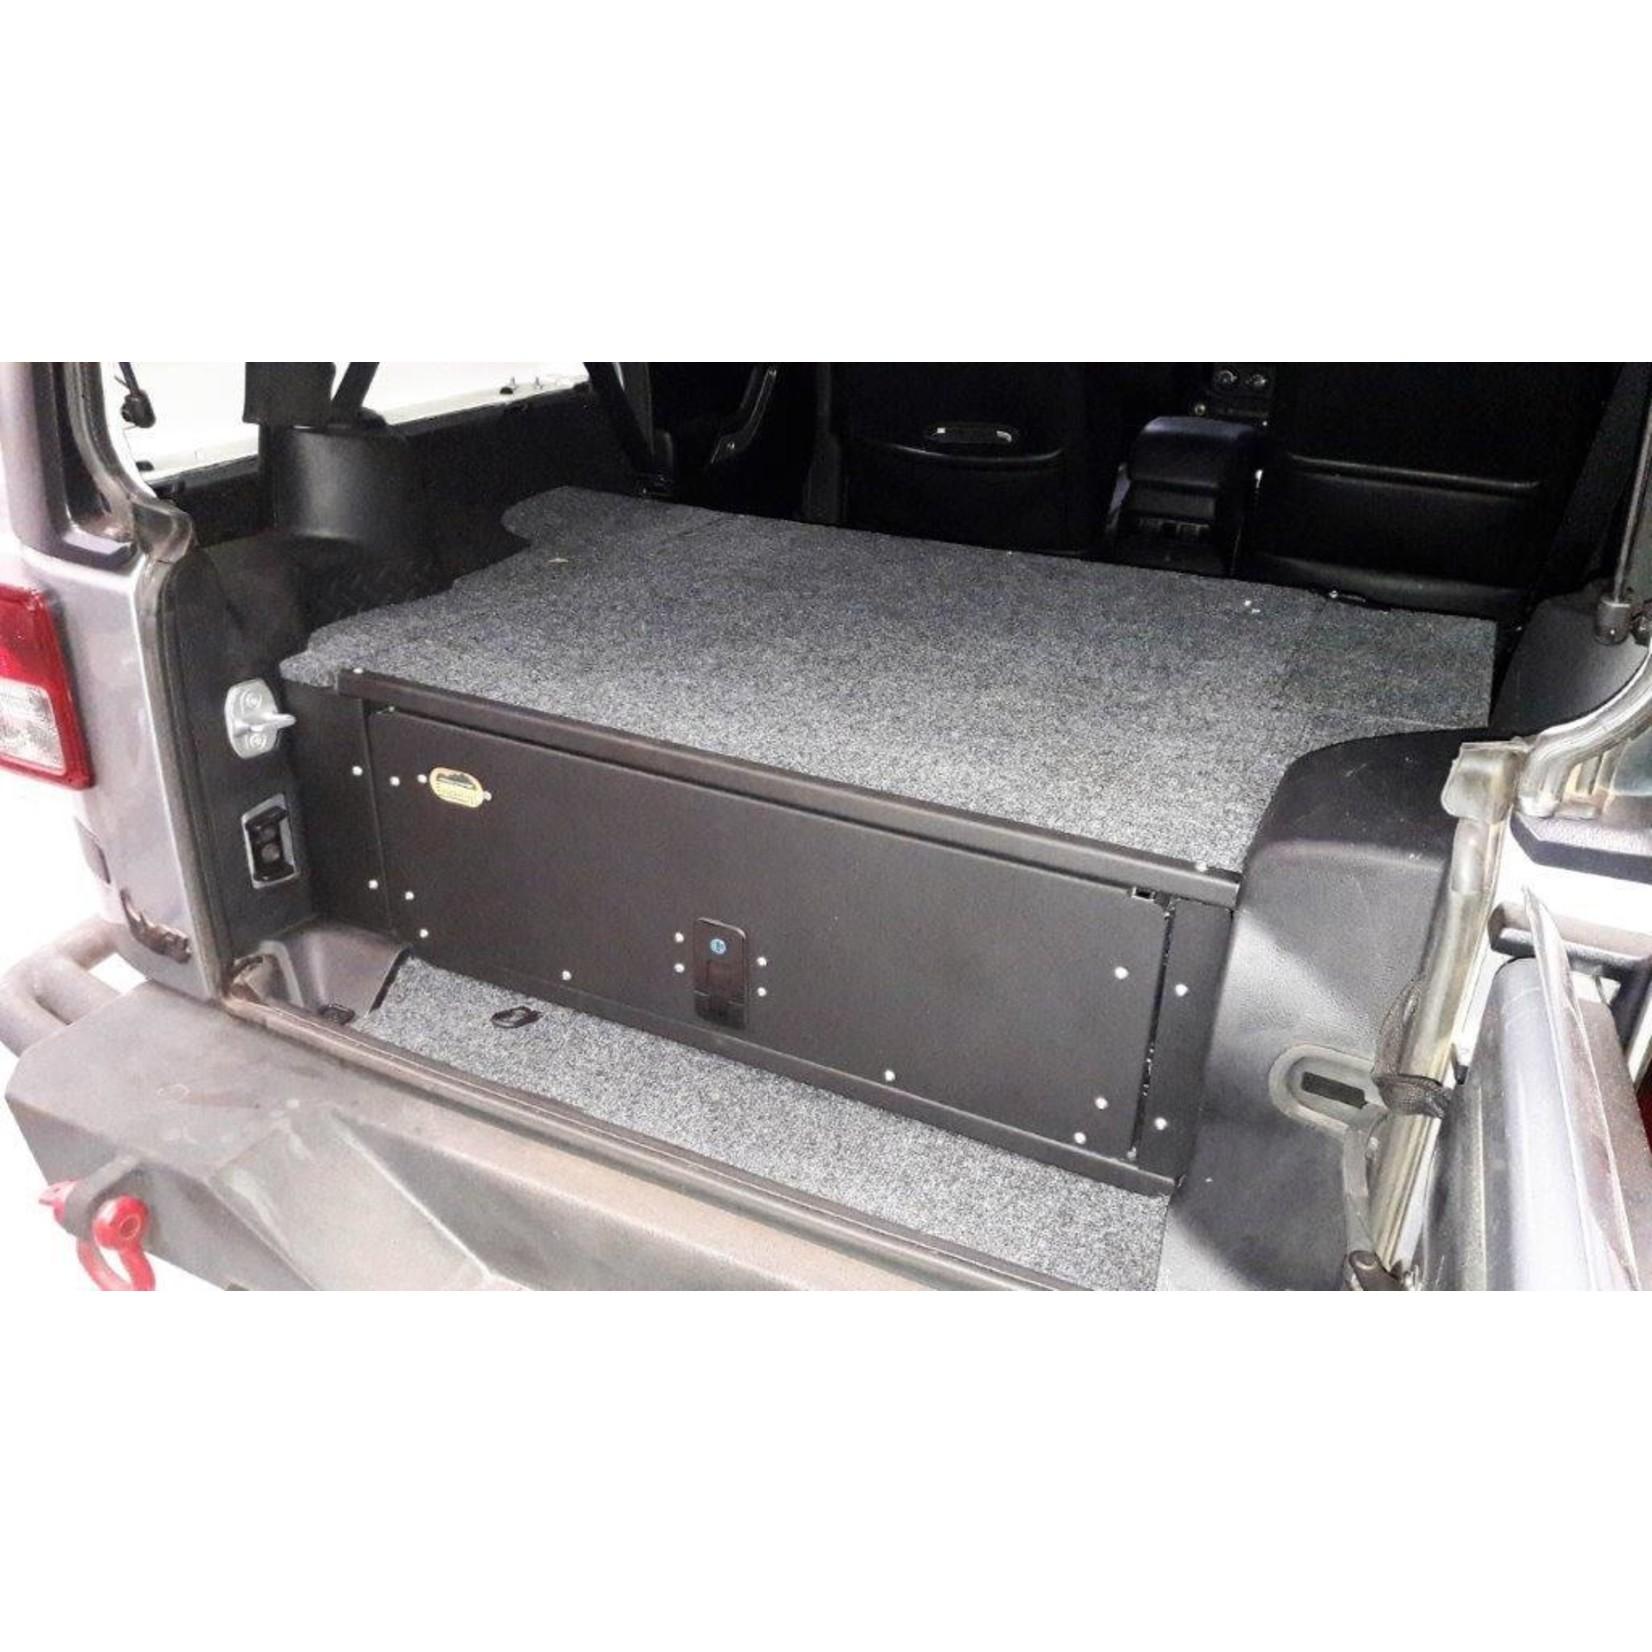 Big Country 4x4 Big Country 4x4 Jeep Wrangler JKU 4-Door 2007-2018 Single Drawer Kit